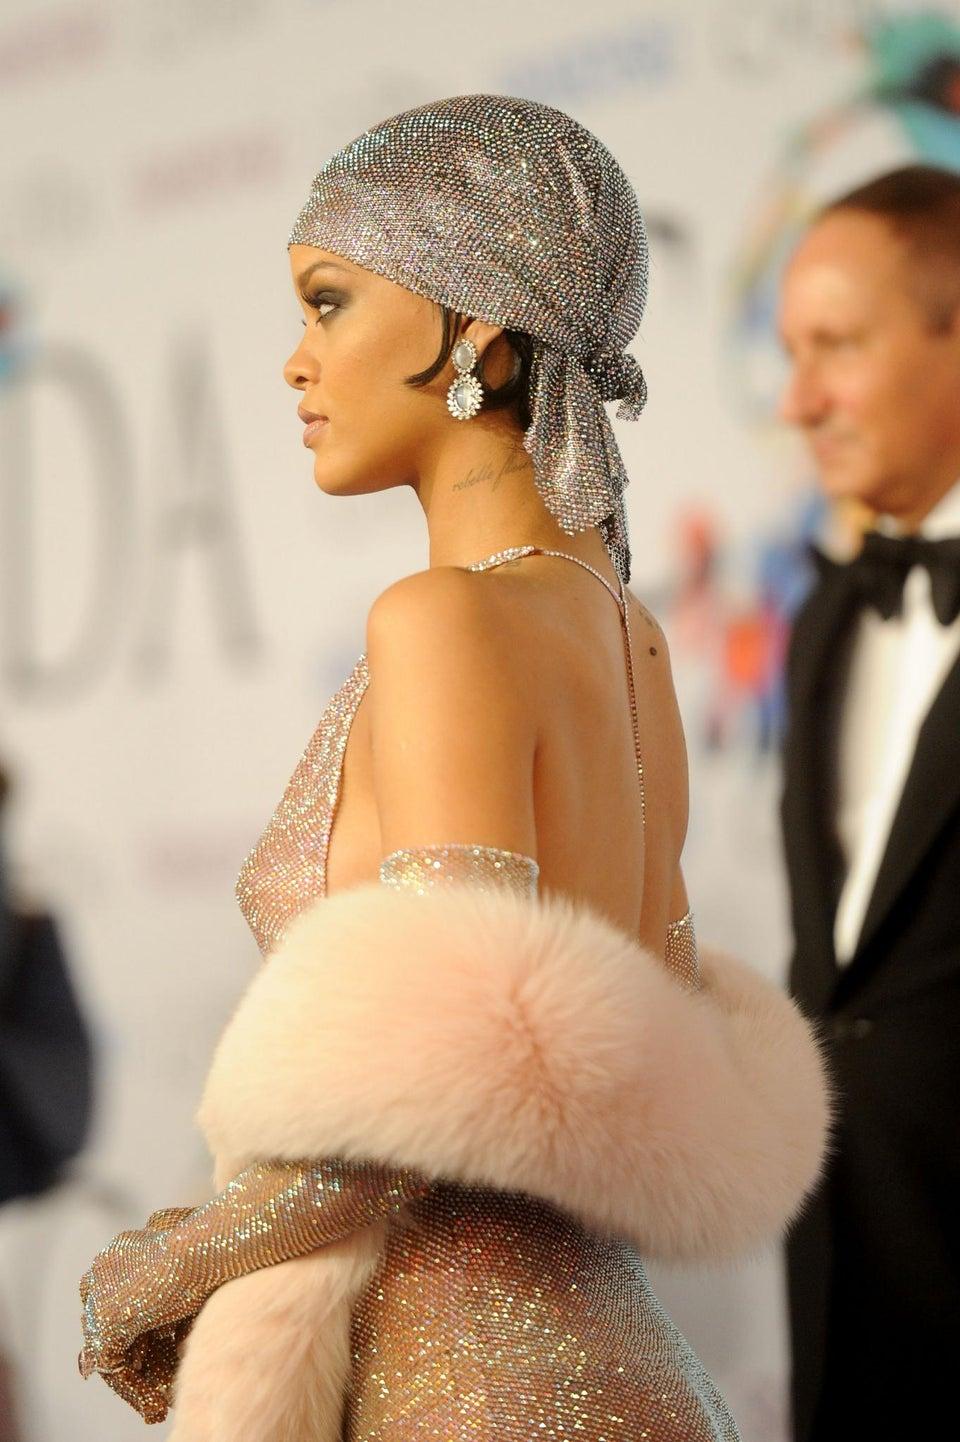 Rihanna Wears Crystal Headscarf to CFDA Awards